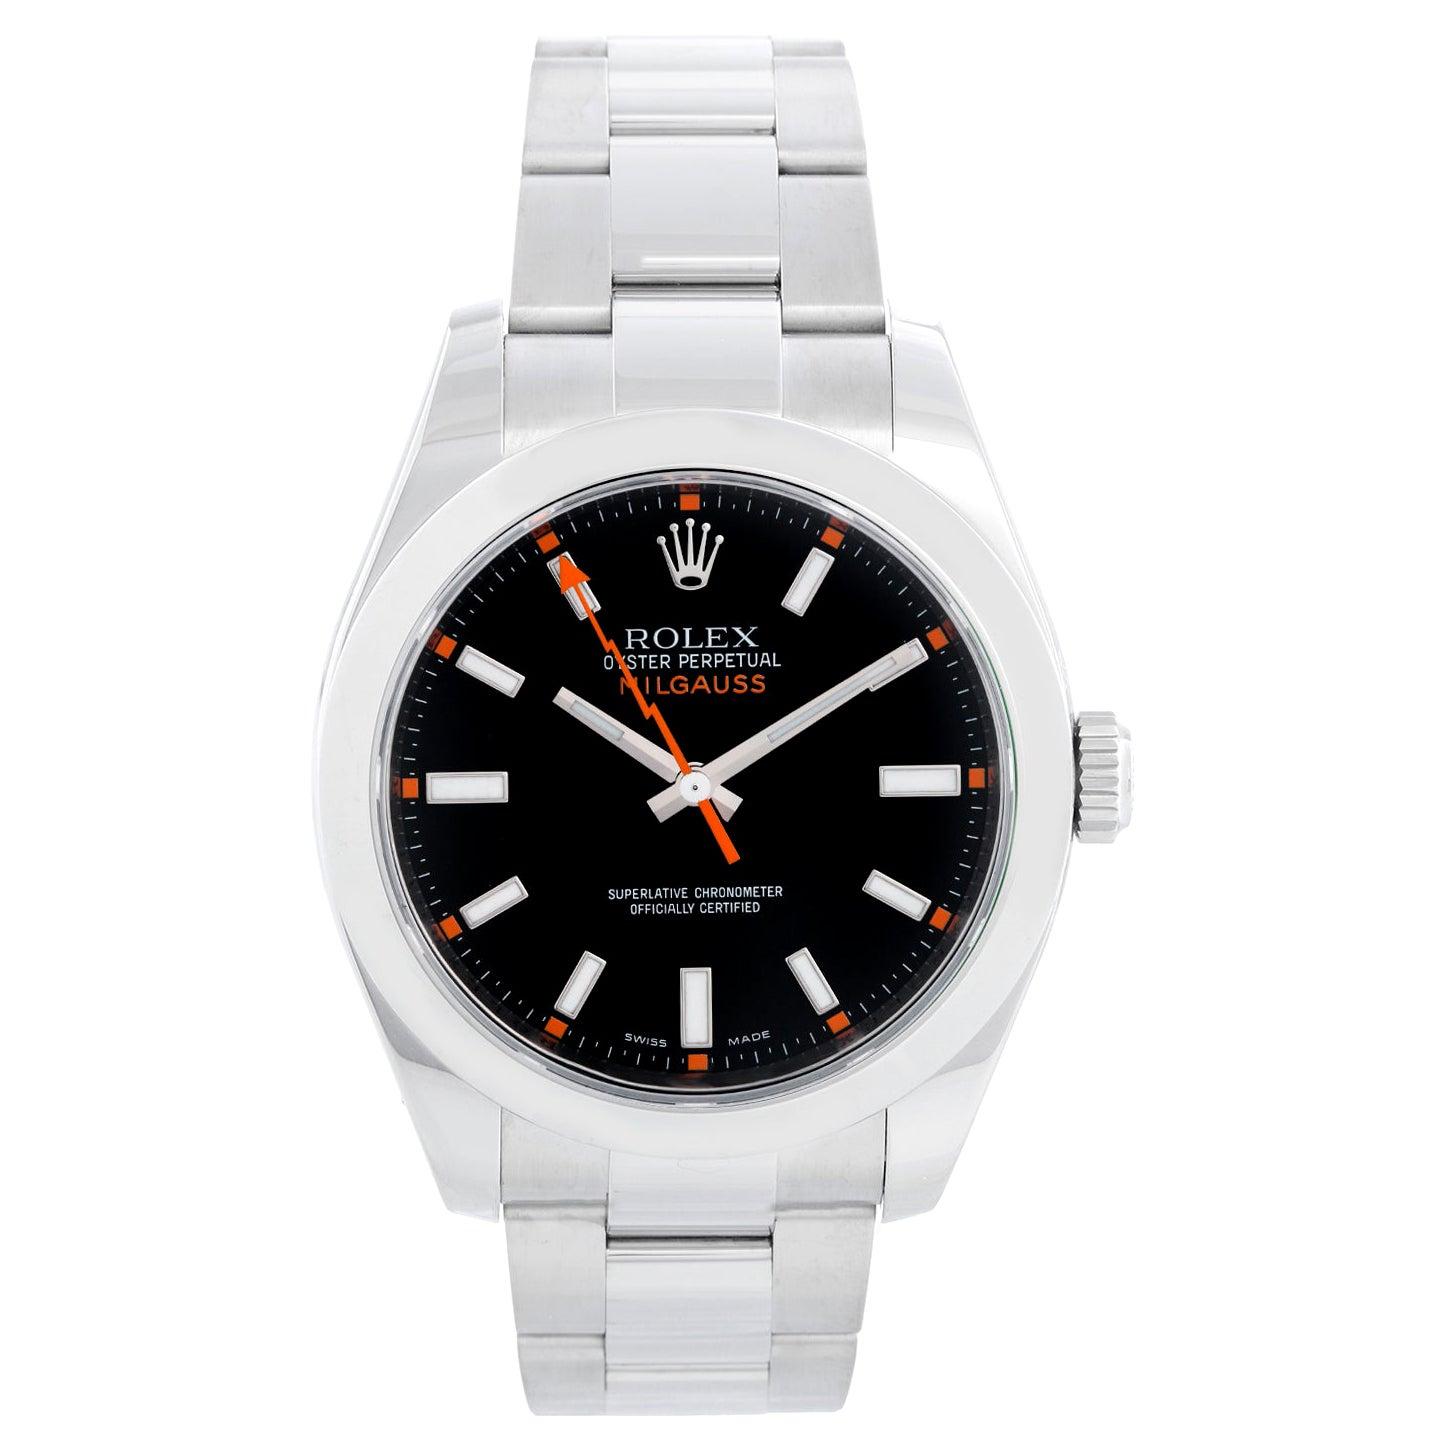 Rolex Milgauss Stainless Steel Men's Watch Black Dial 116400